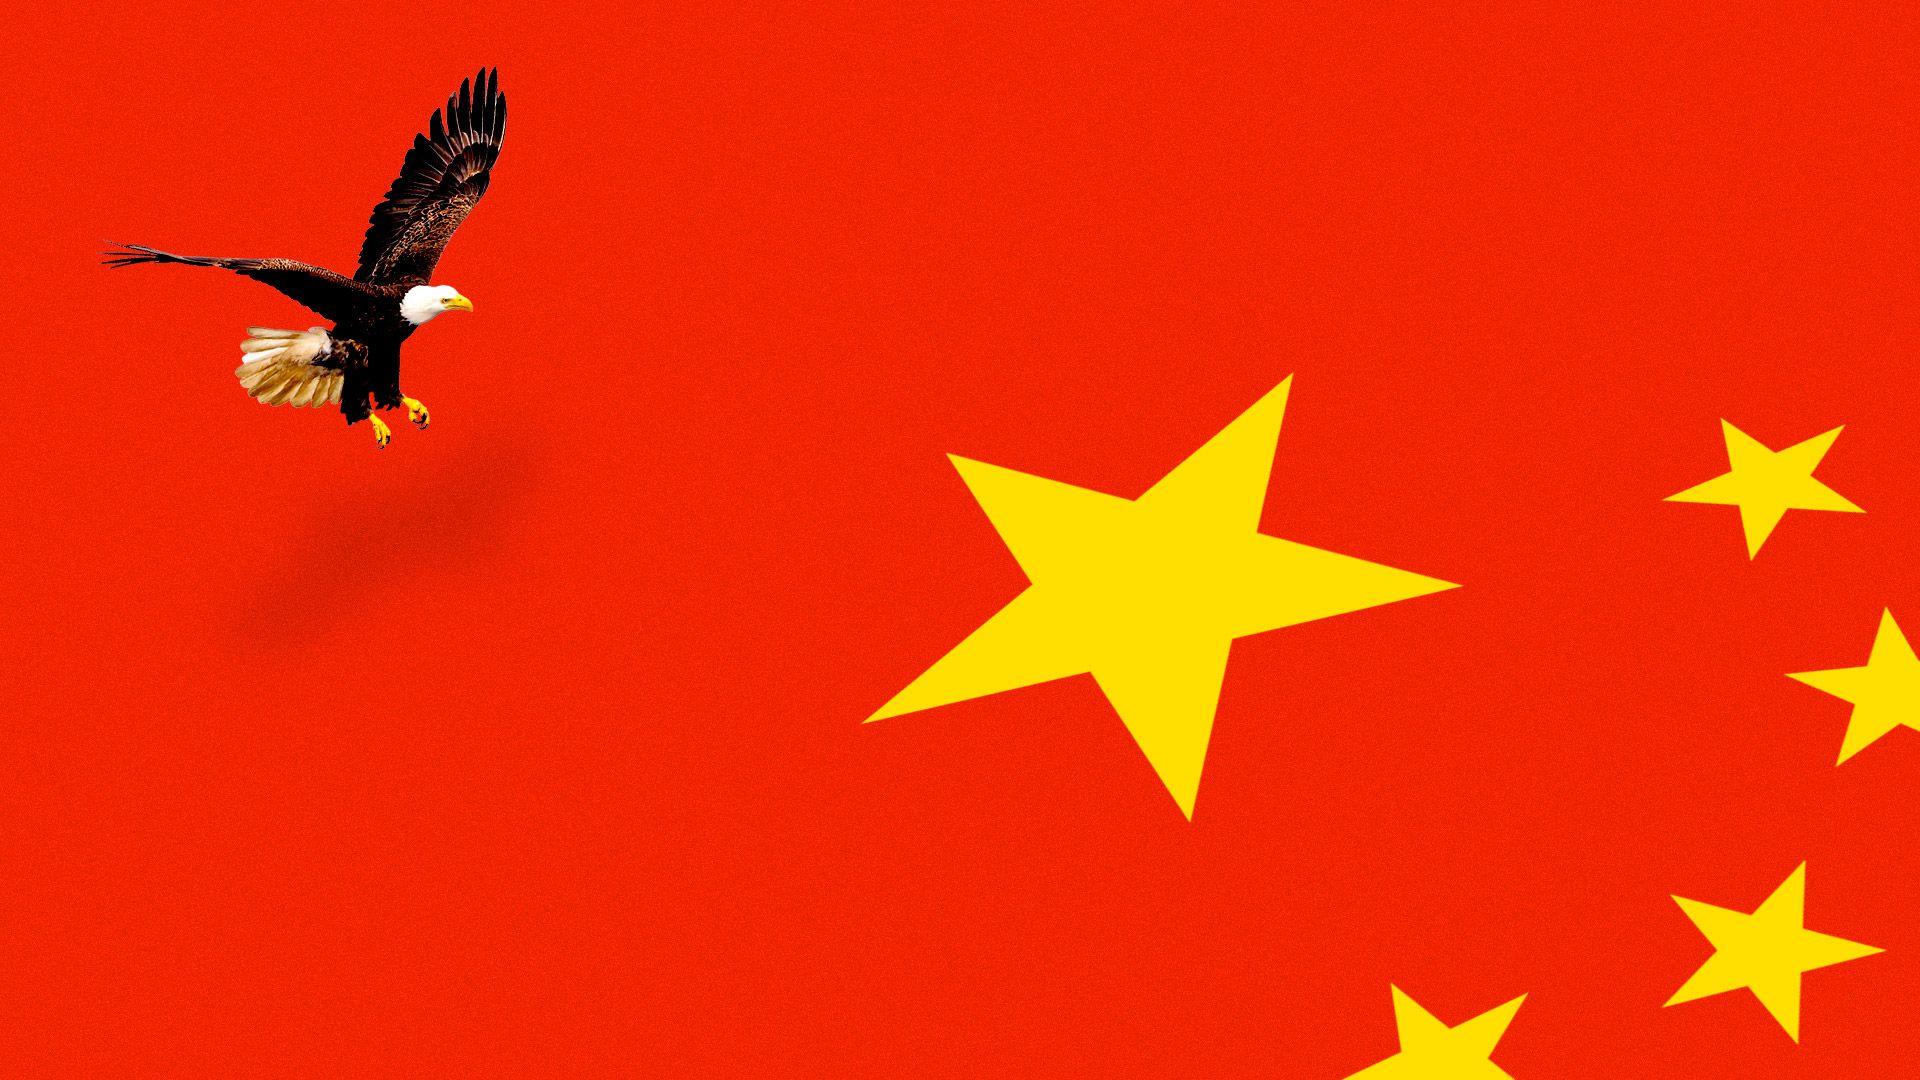 axios.com - The Trump administration's secret anti-China plans